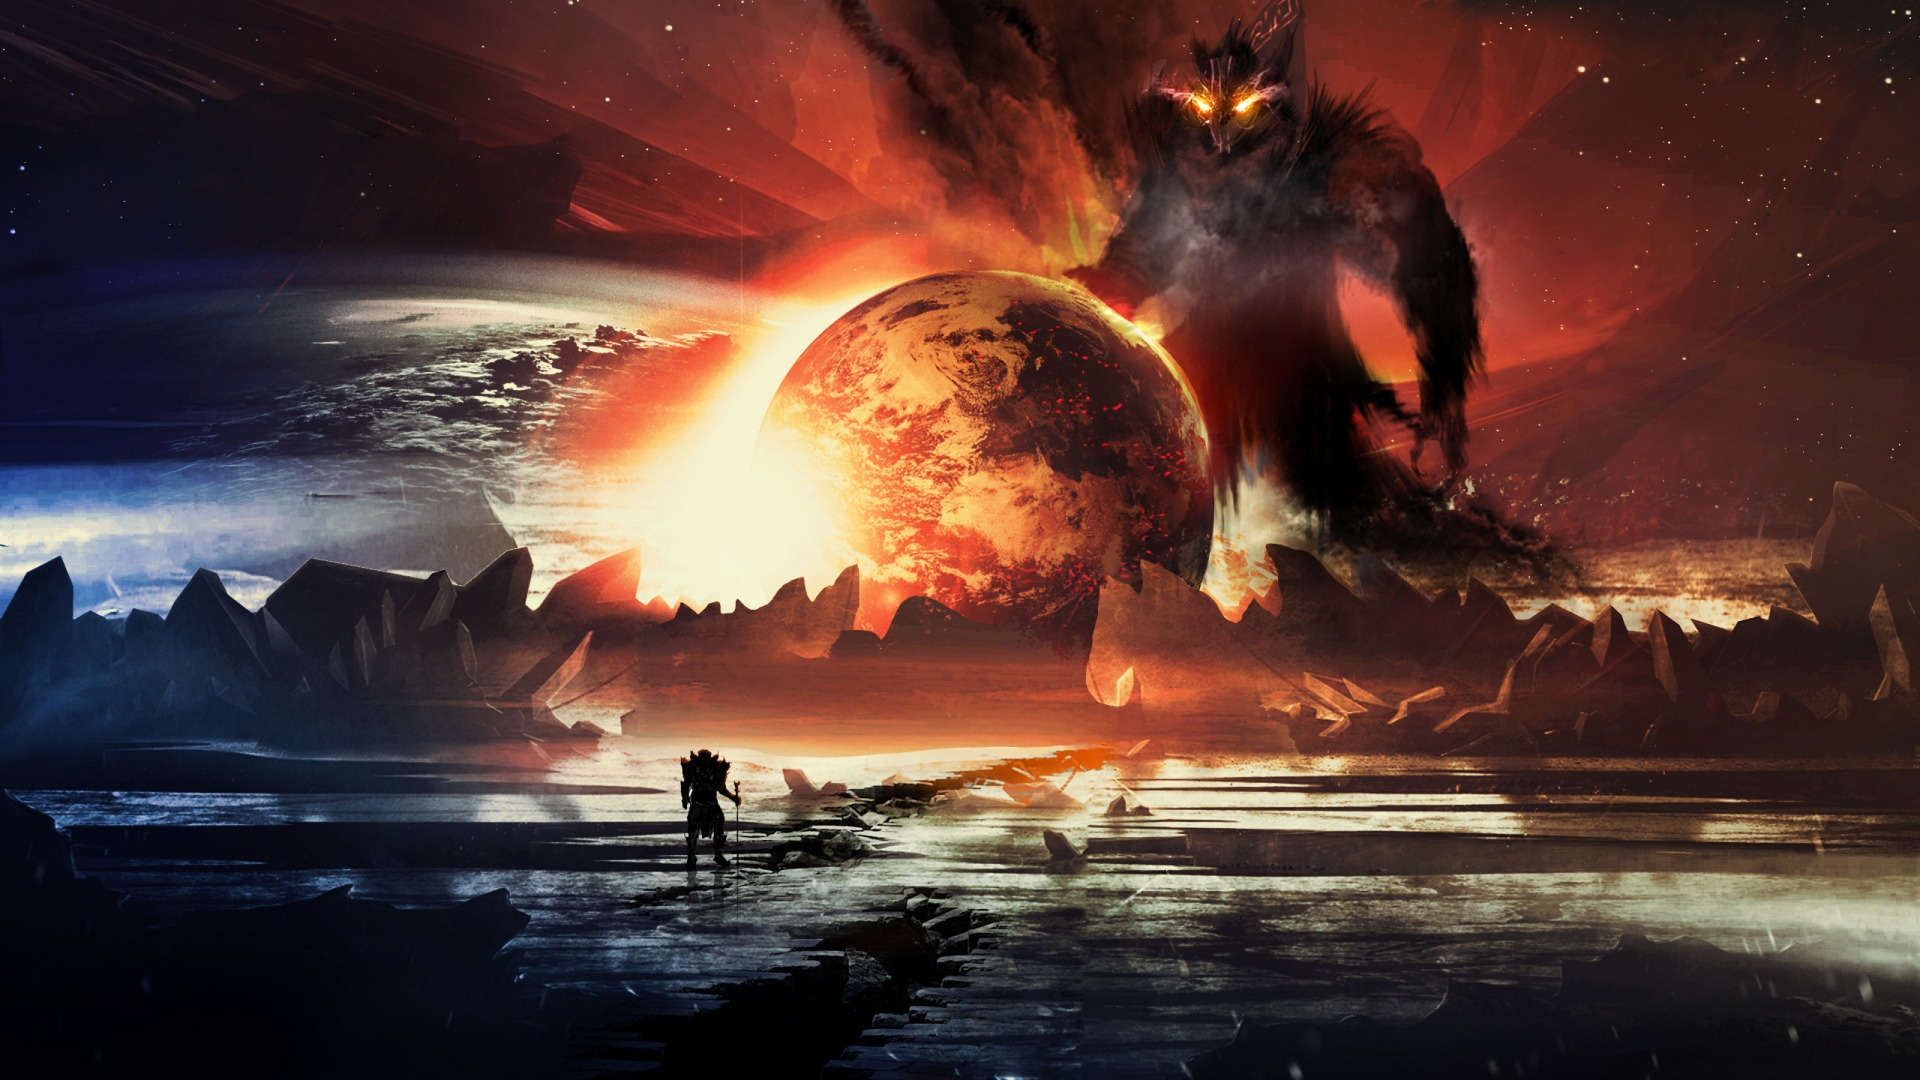 Giant Art desktop wallpaper free download